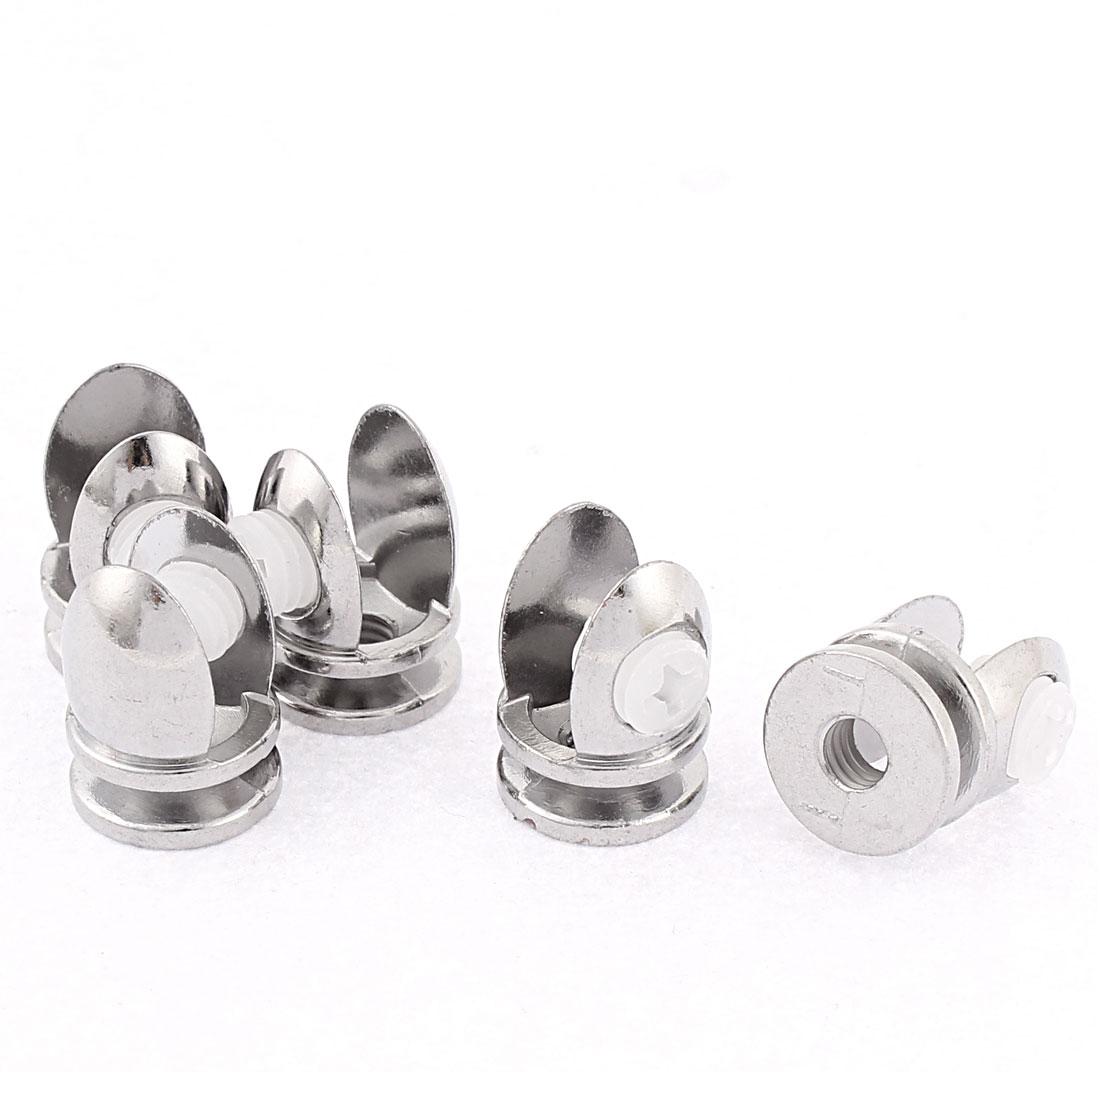 Plastic Screw Mounting 5-8mm Glass Shelf Clamp Clip Holder Support Bracket 5pcs